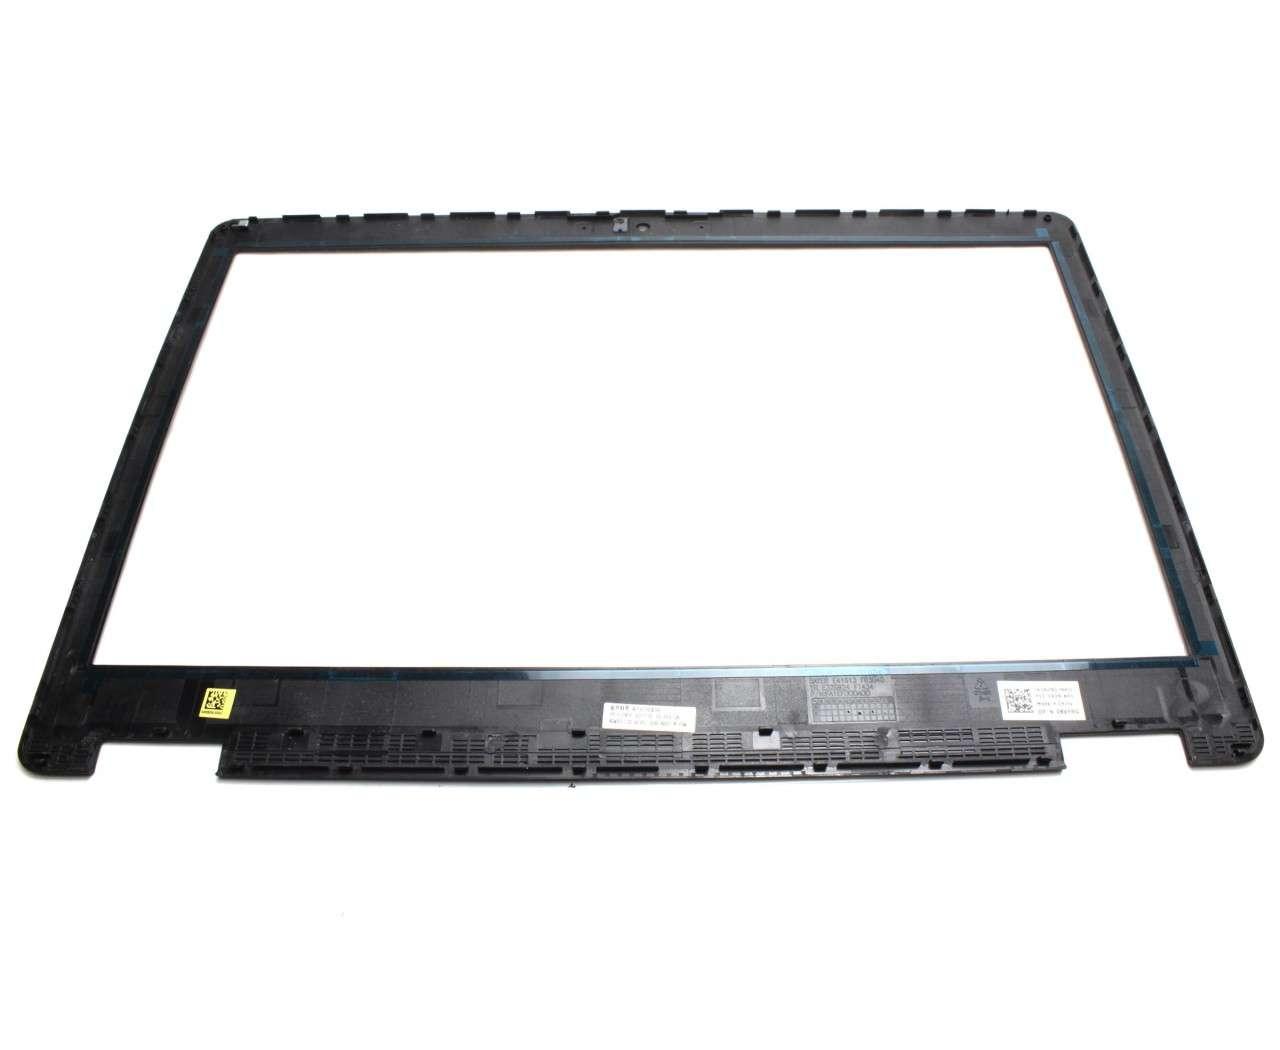 Rama Display Dell Precision 15 3510 Bezel Front Cover Neagra pentru display fara touchscreen imagine powerlaptop.ro 2021